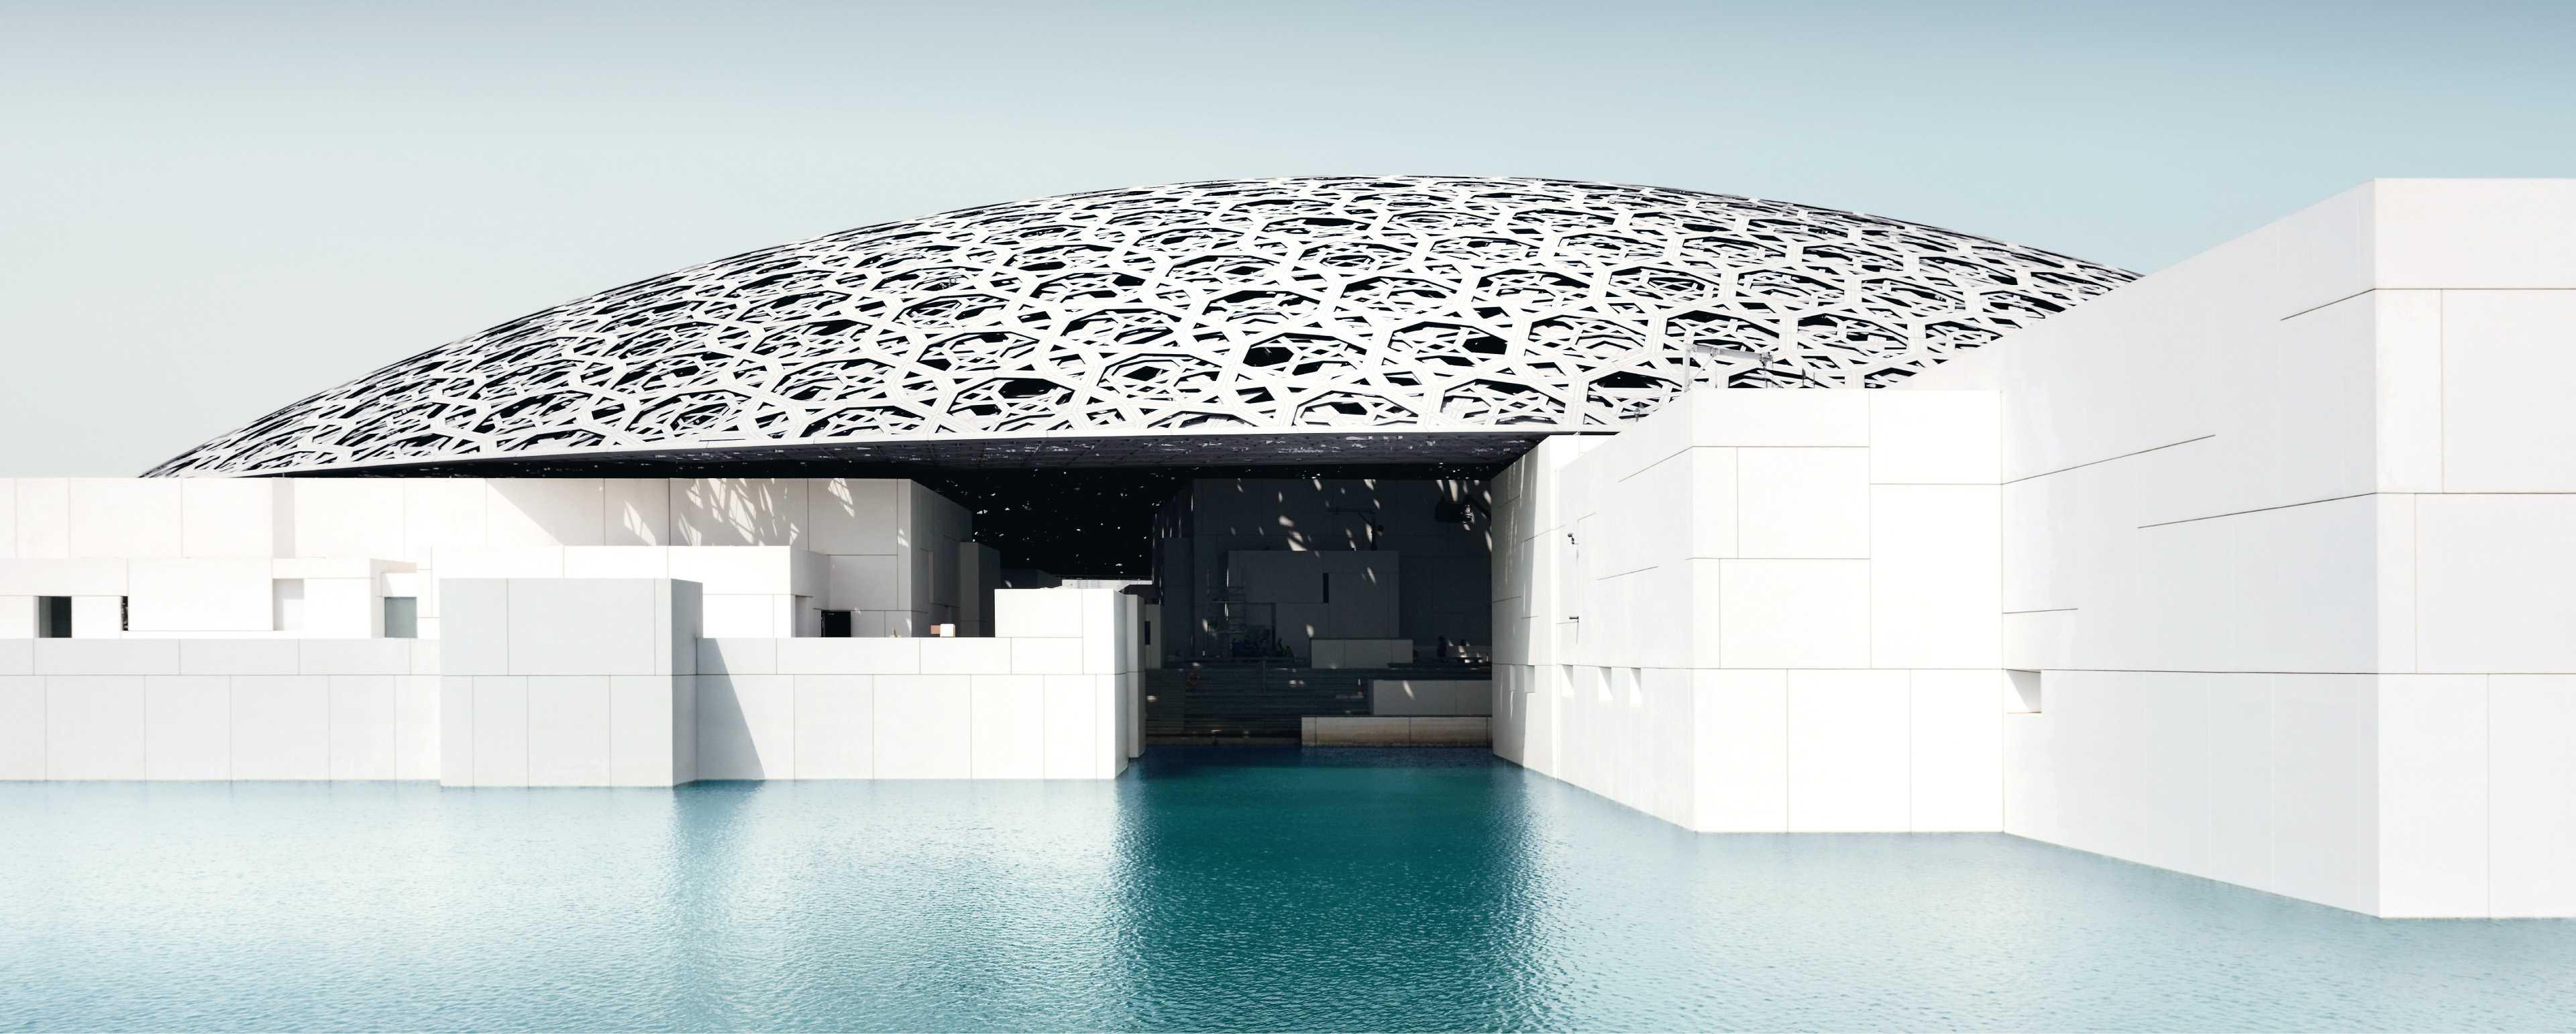 Louvre Abu Dhabi  -  45